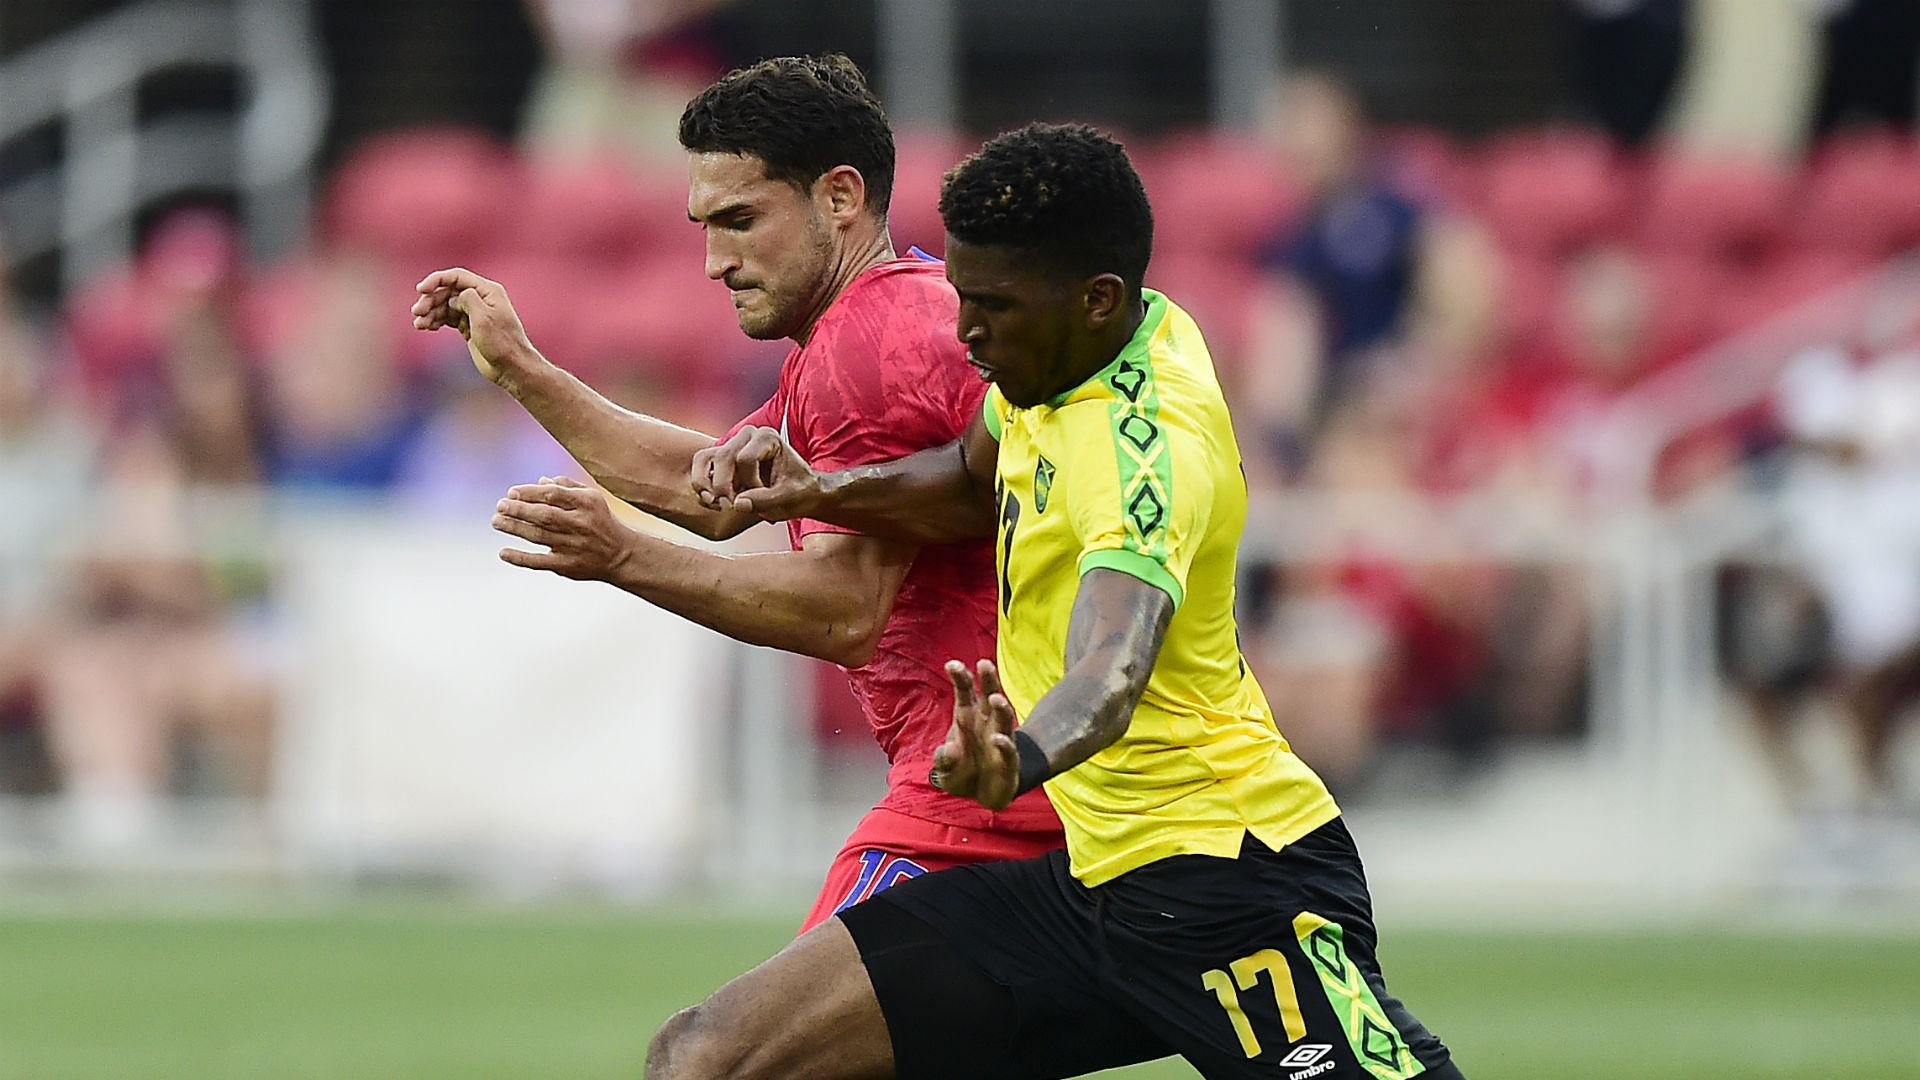 Cristian Roldan Damion Lowe USA Jamaica 2019